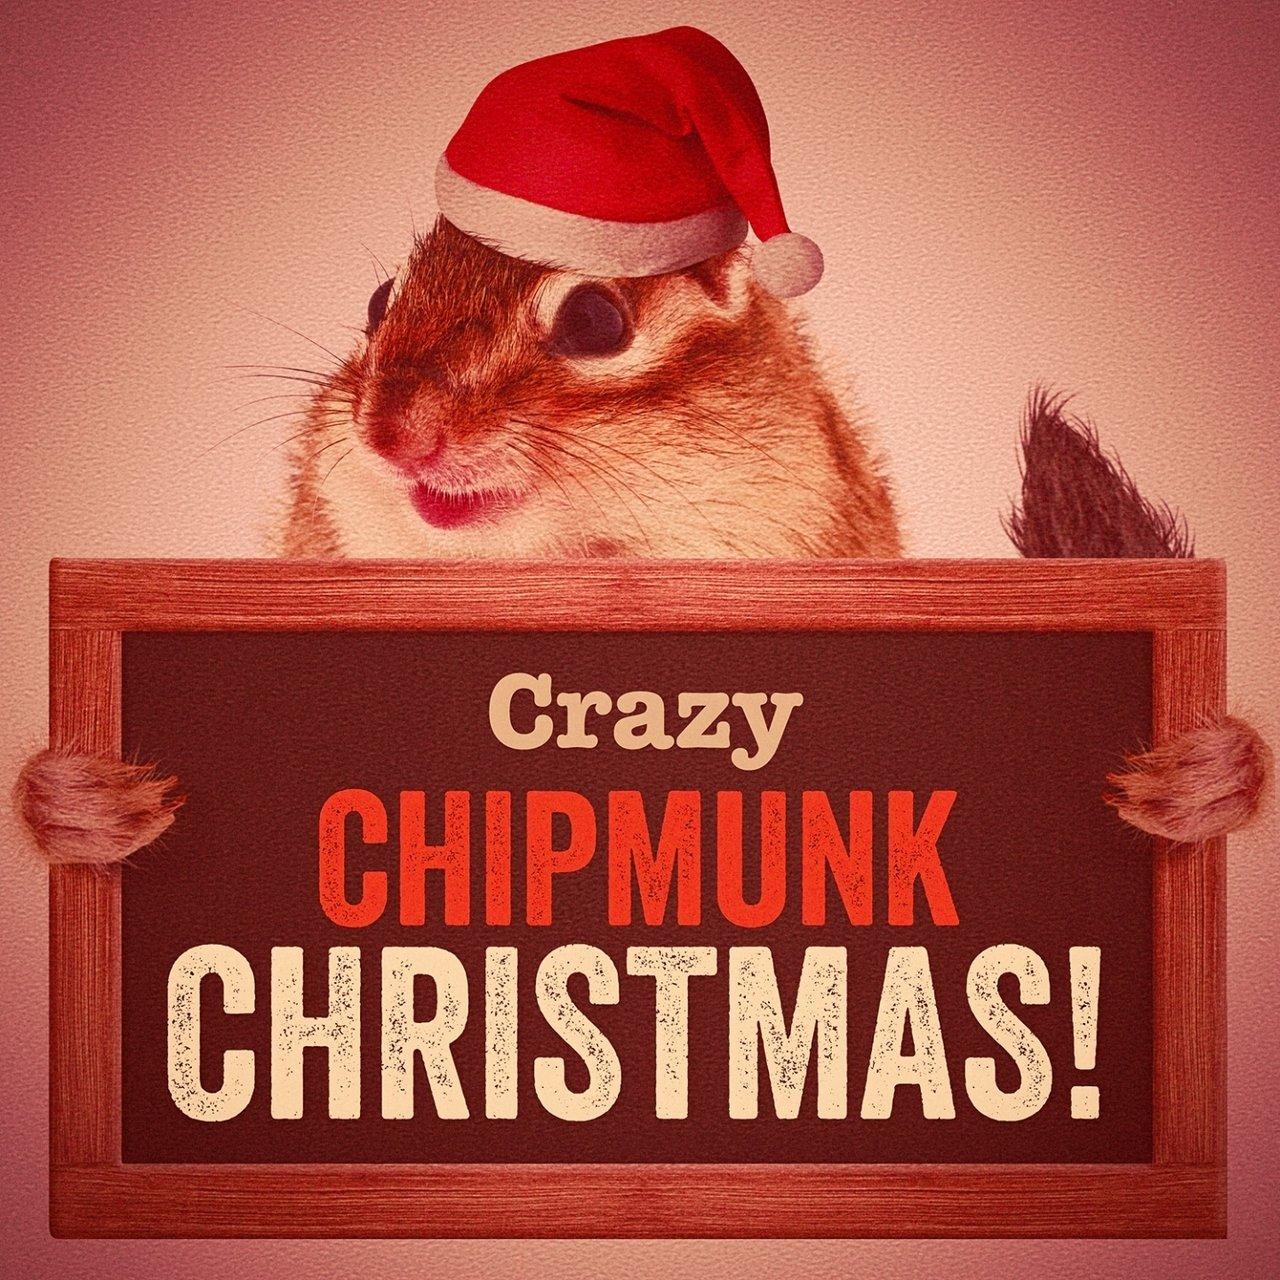 TIDAL: Listen to Crazy Chipmunk Christmas! on TIDAL